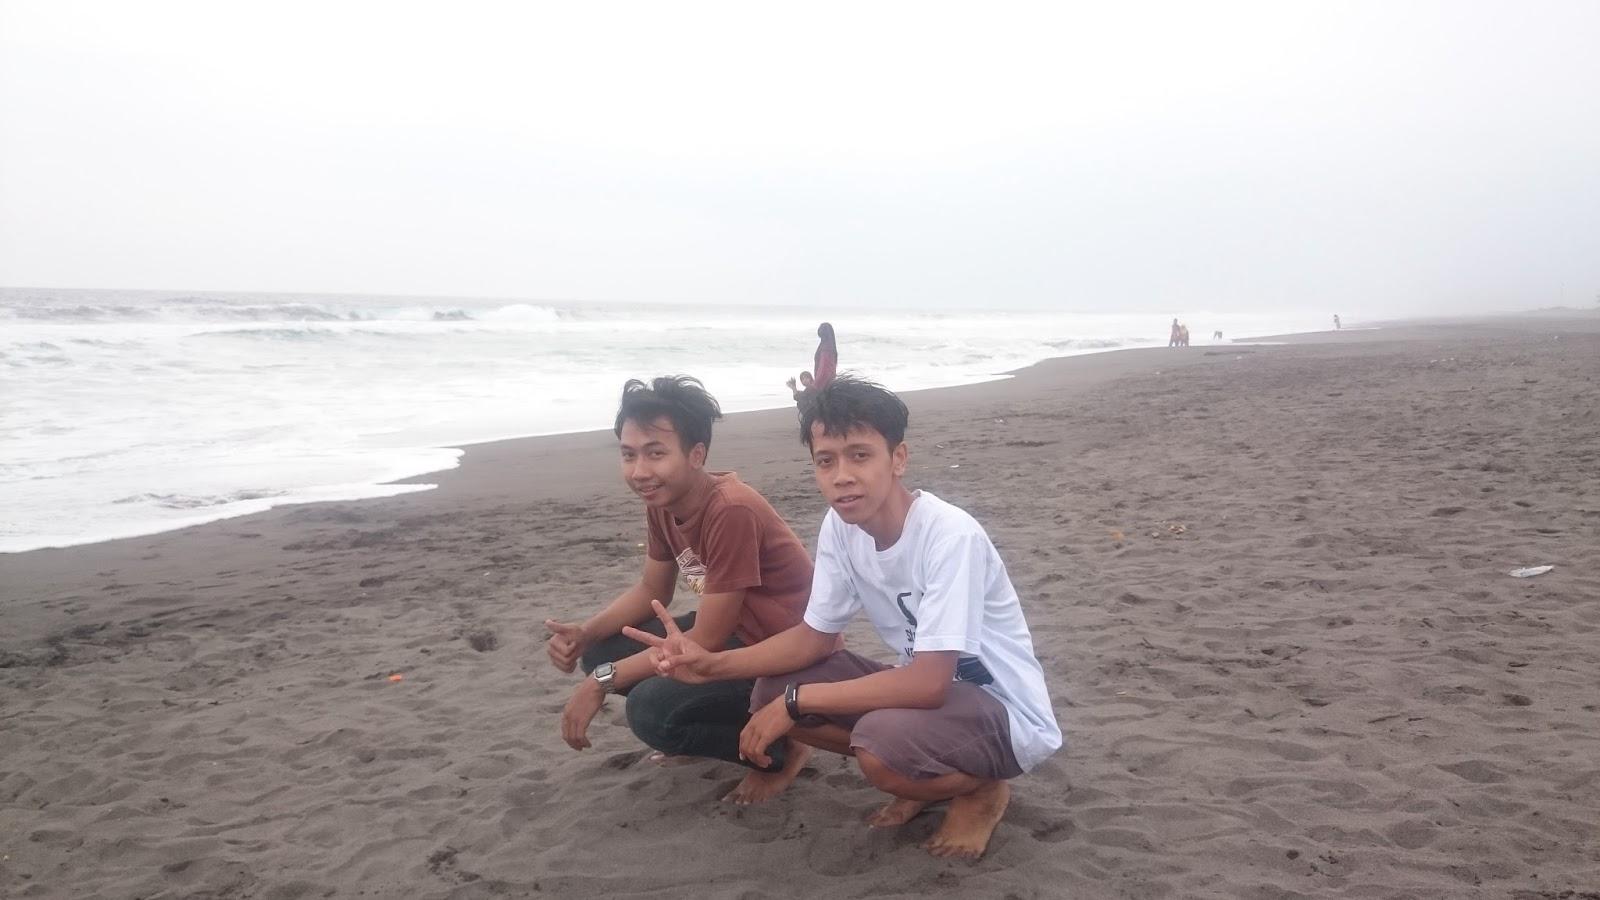 Wisata Alam Pantai Lembupurwo Terletak Desa Kecamatan Mirit Kabupaten Kebumen